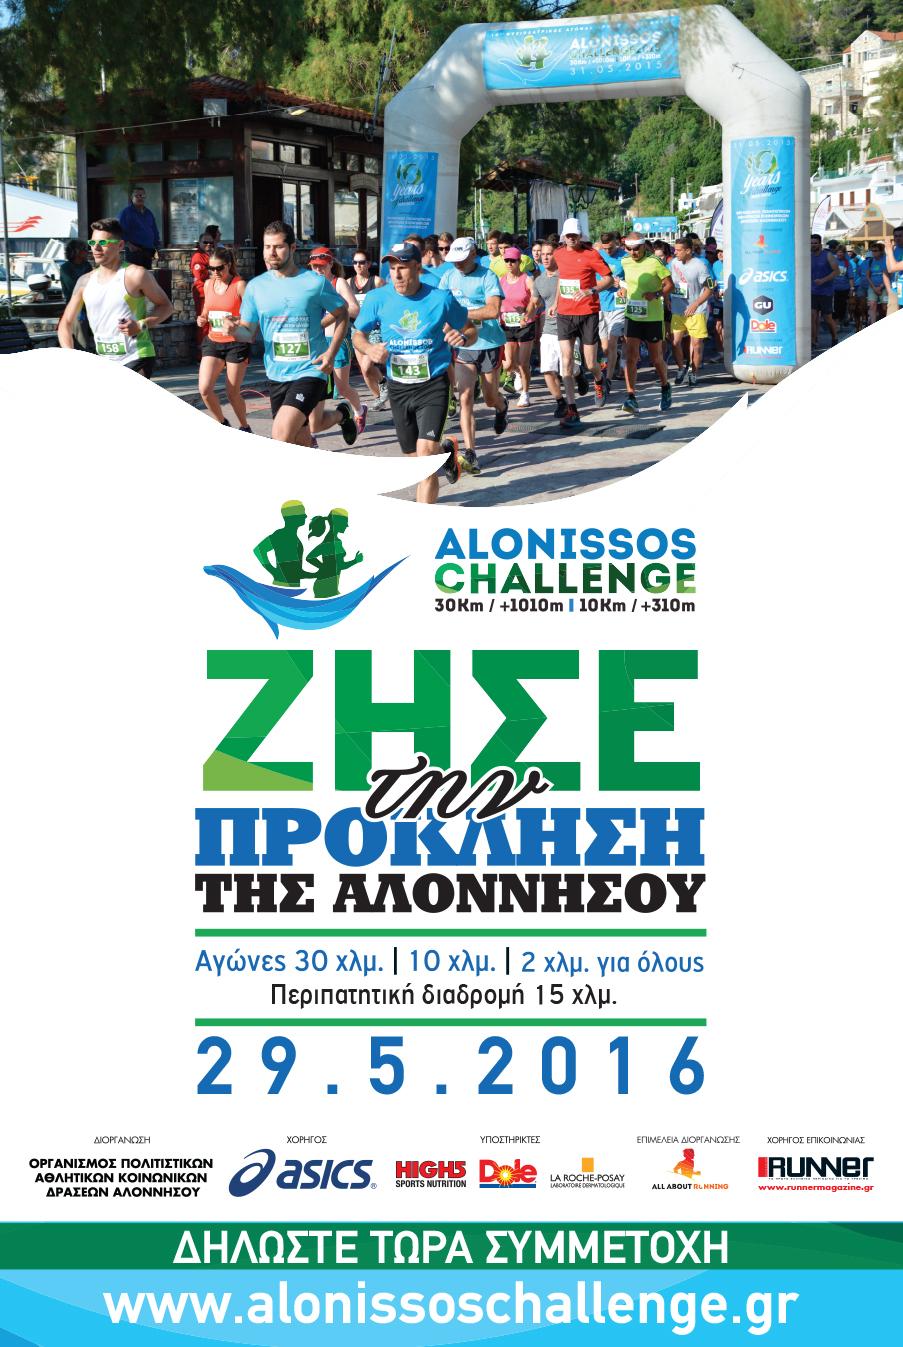 Alonissoschallenge2016 web